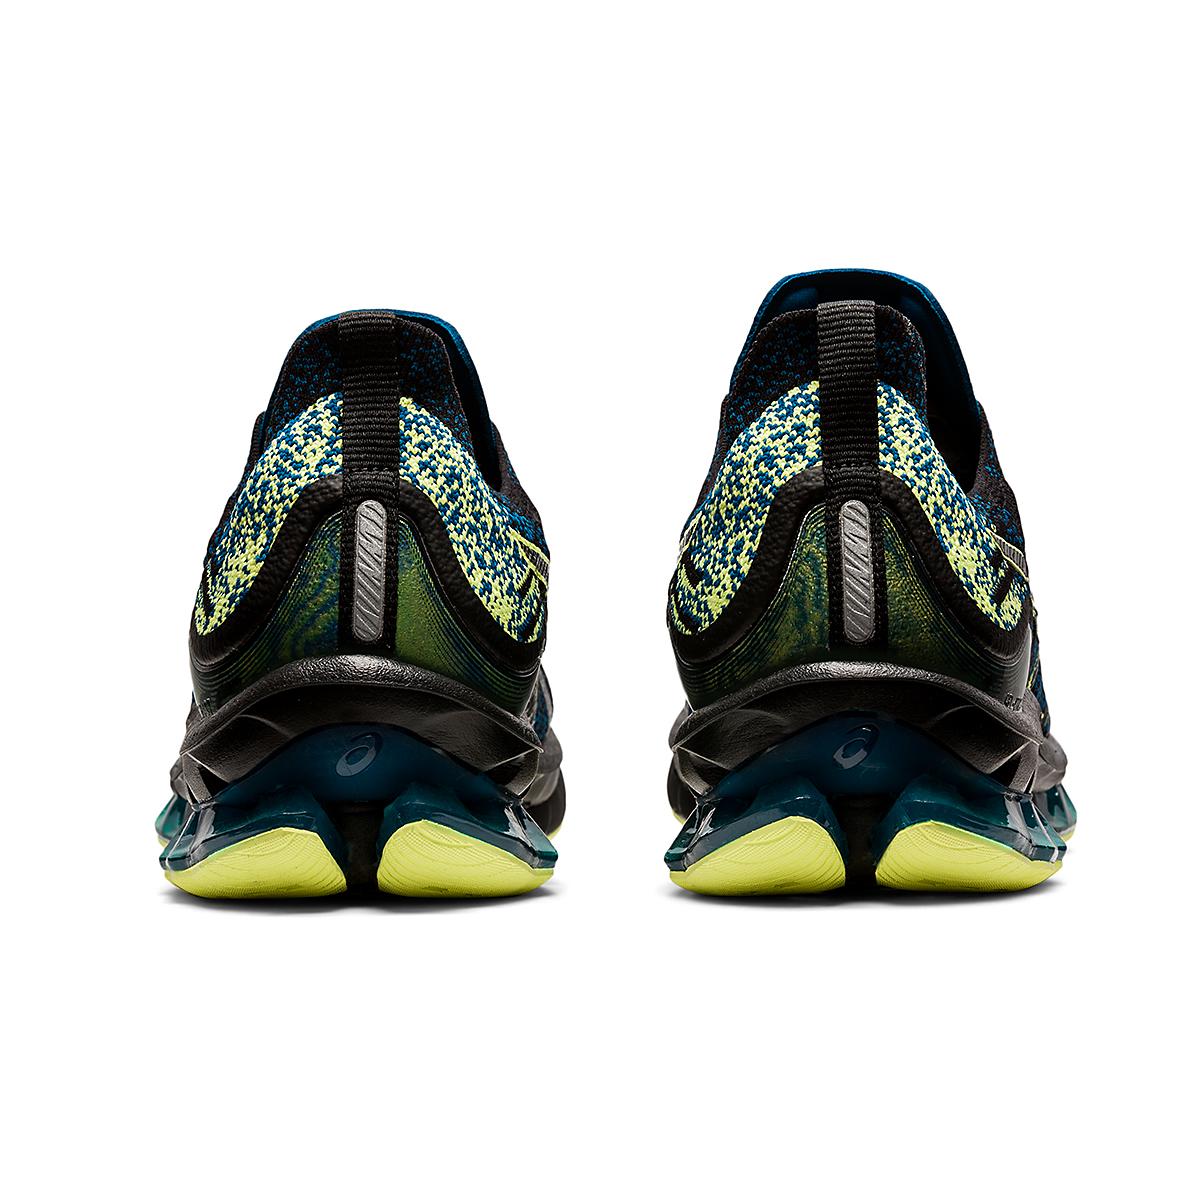 Men's Asics Kinsei Blast Running Shoe - Color: Black/Glow Yellow - Size: 6 - Width: Regular, Black/Glow Yellow, large, image 6